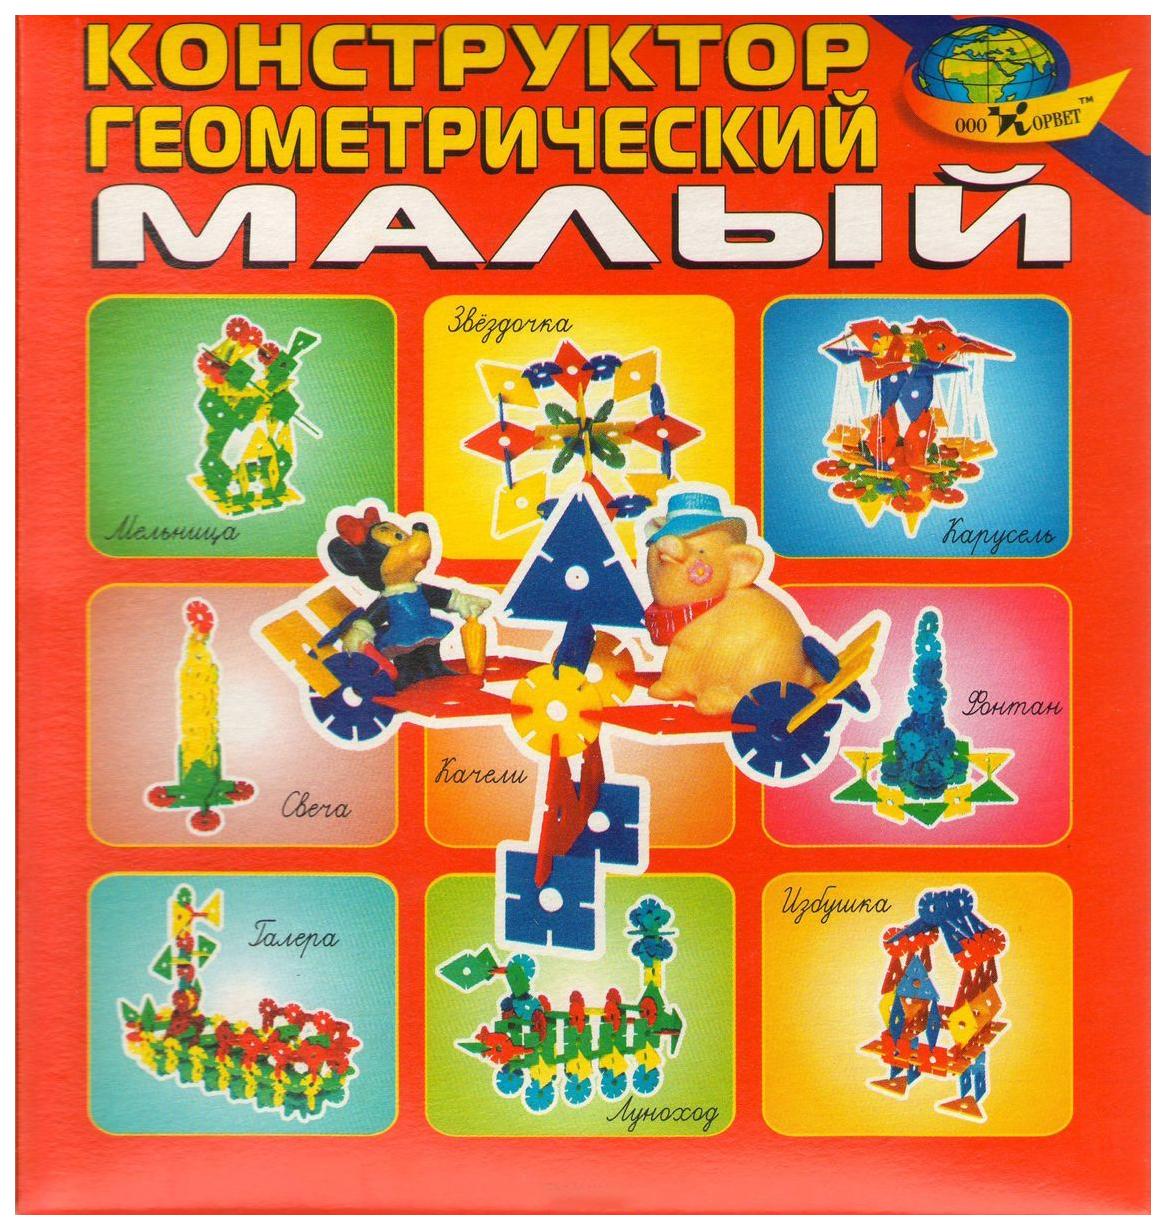 Корвет Конструктор геометрический малый (Корвет) фото